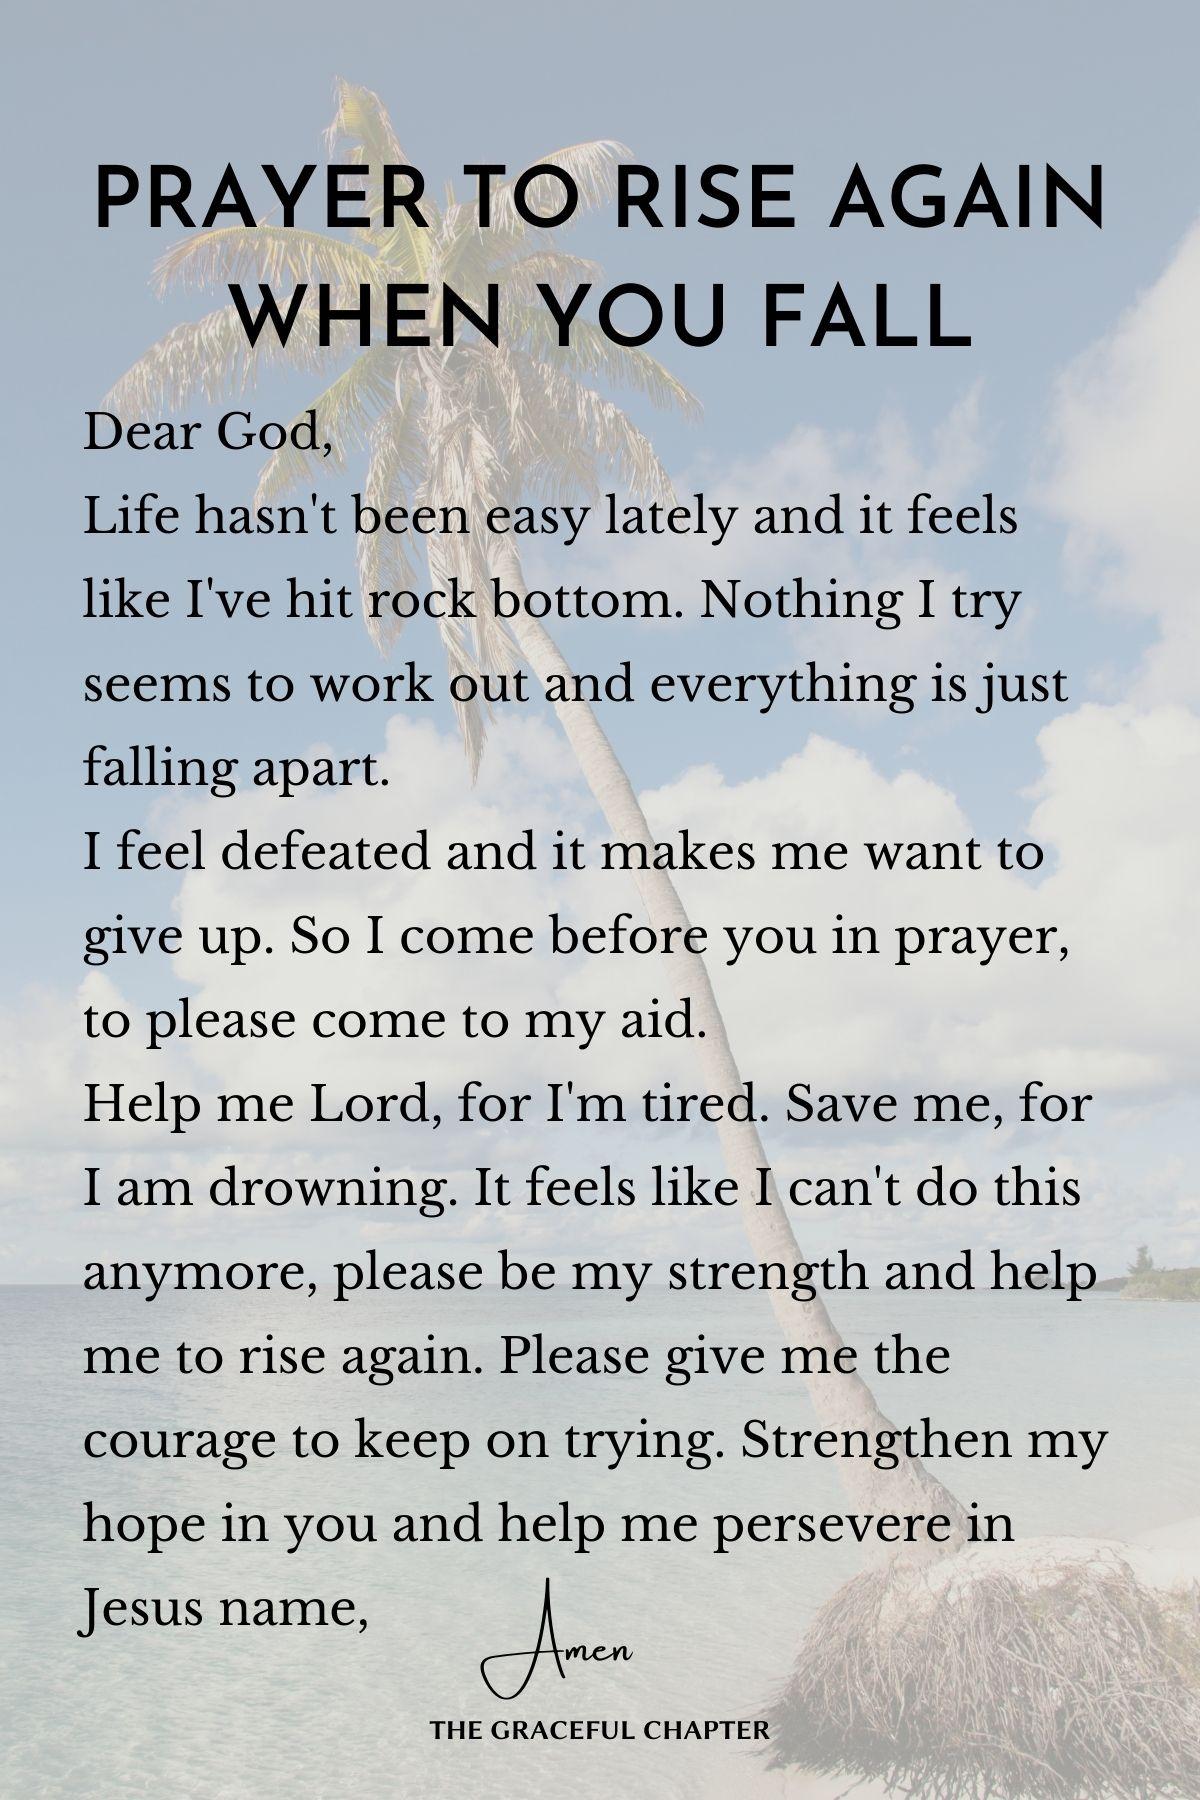 Prayer to rise again when you fall